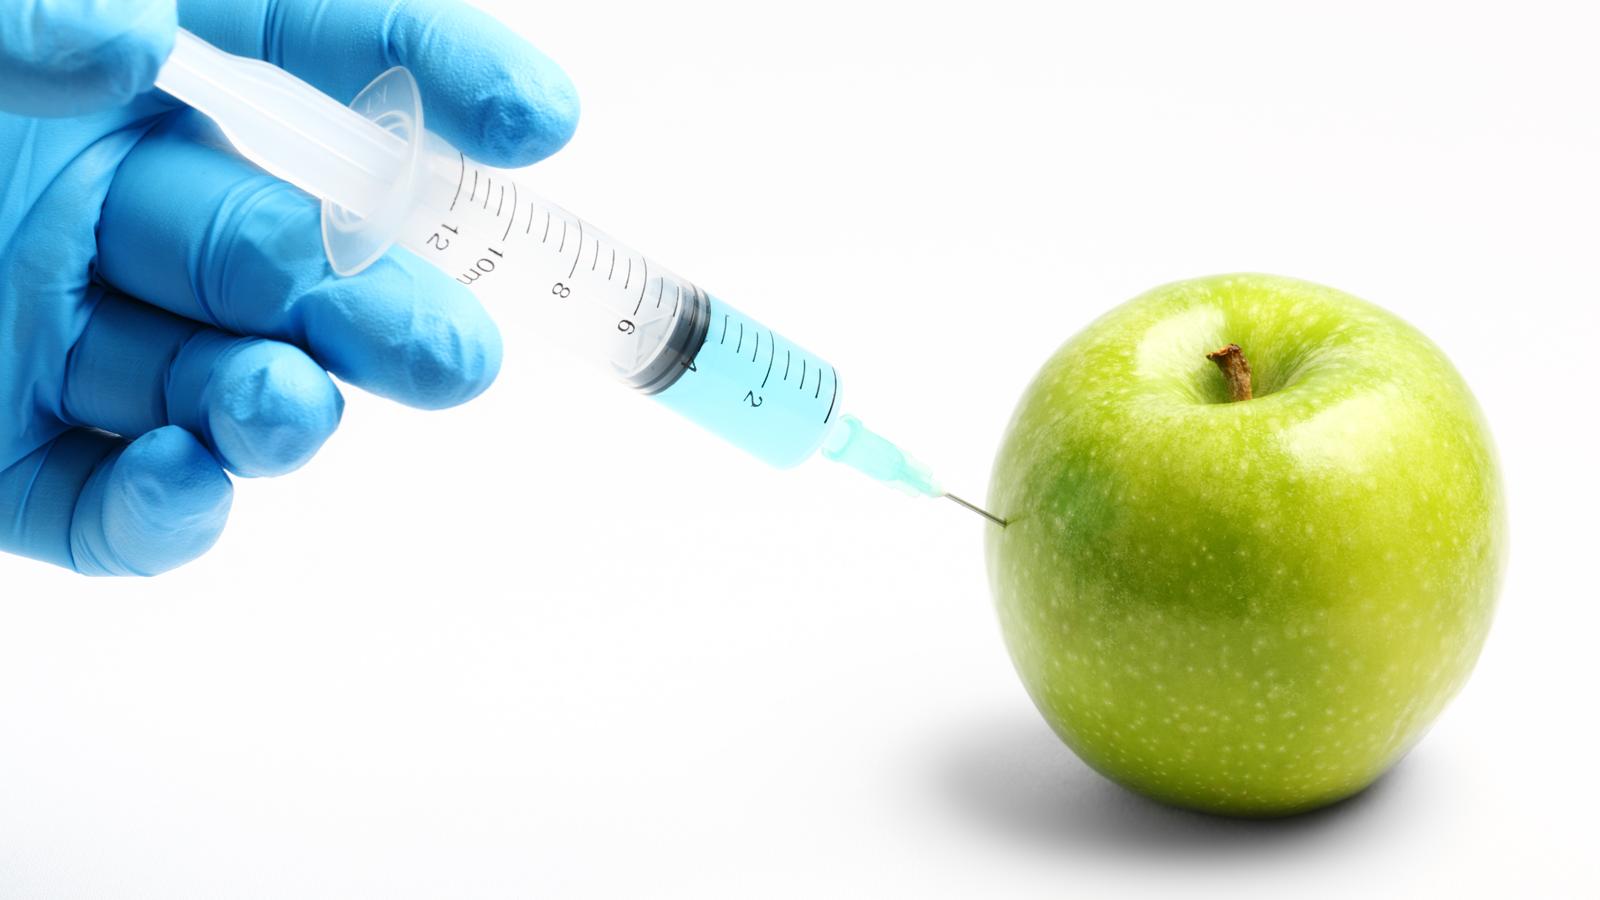 Organismos Genéticamente Modificados | OCU